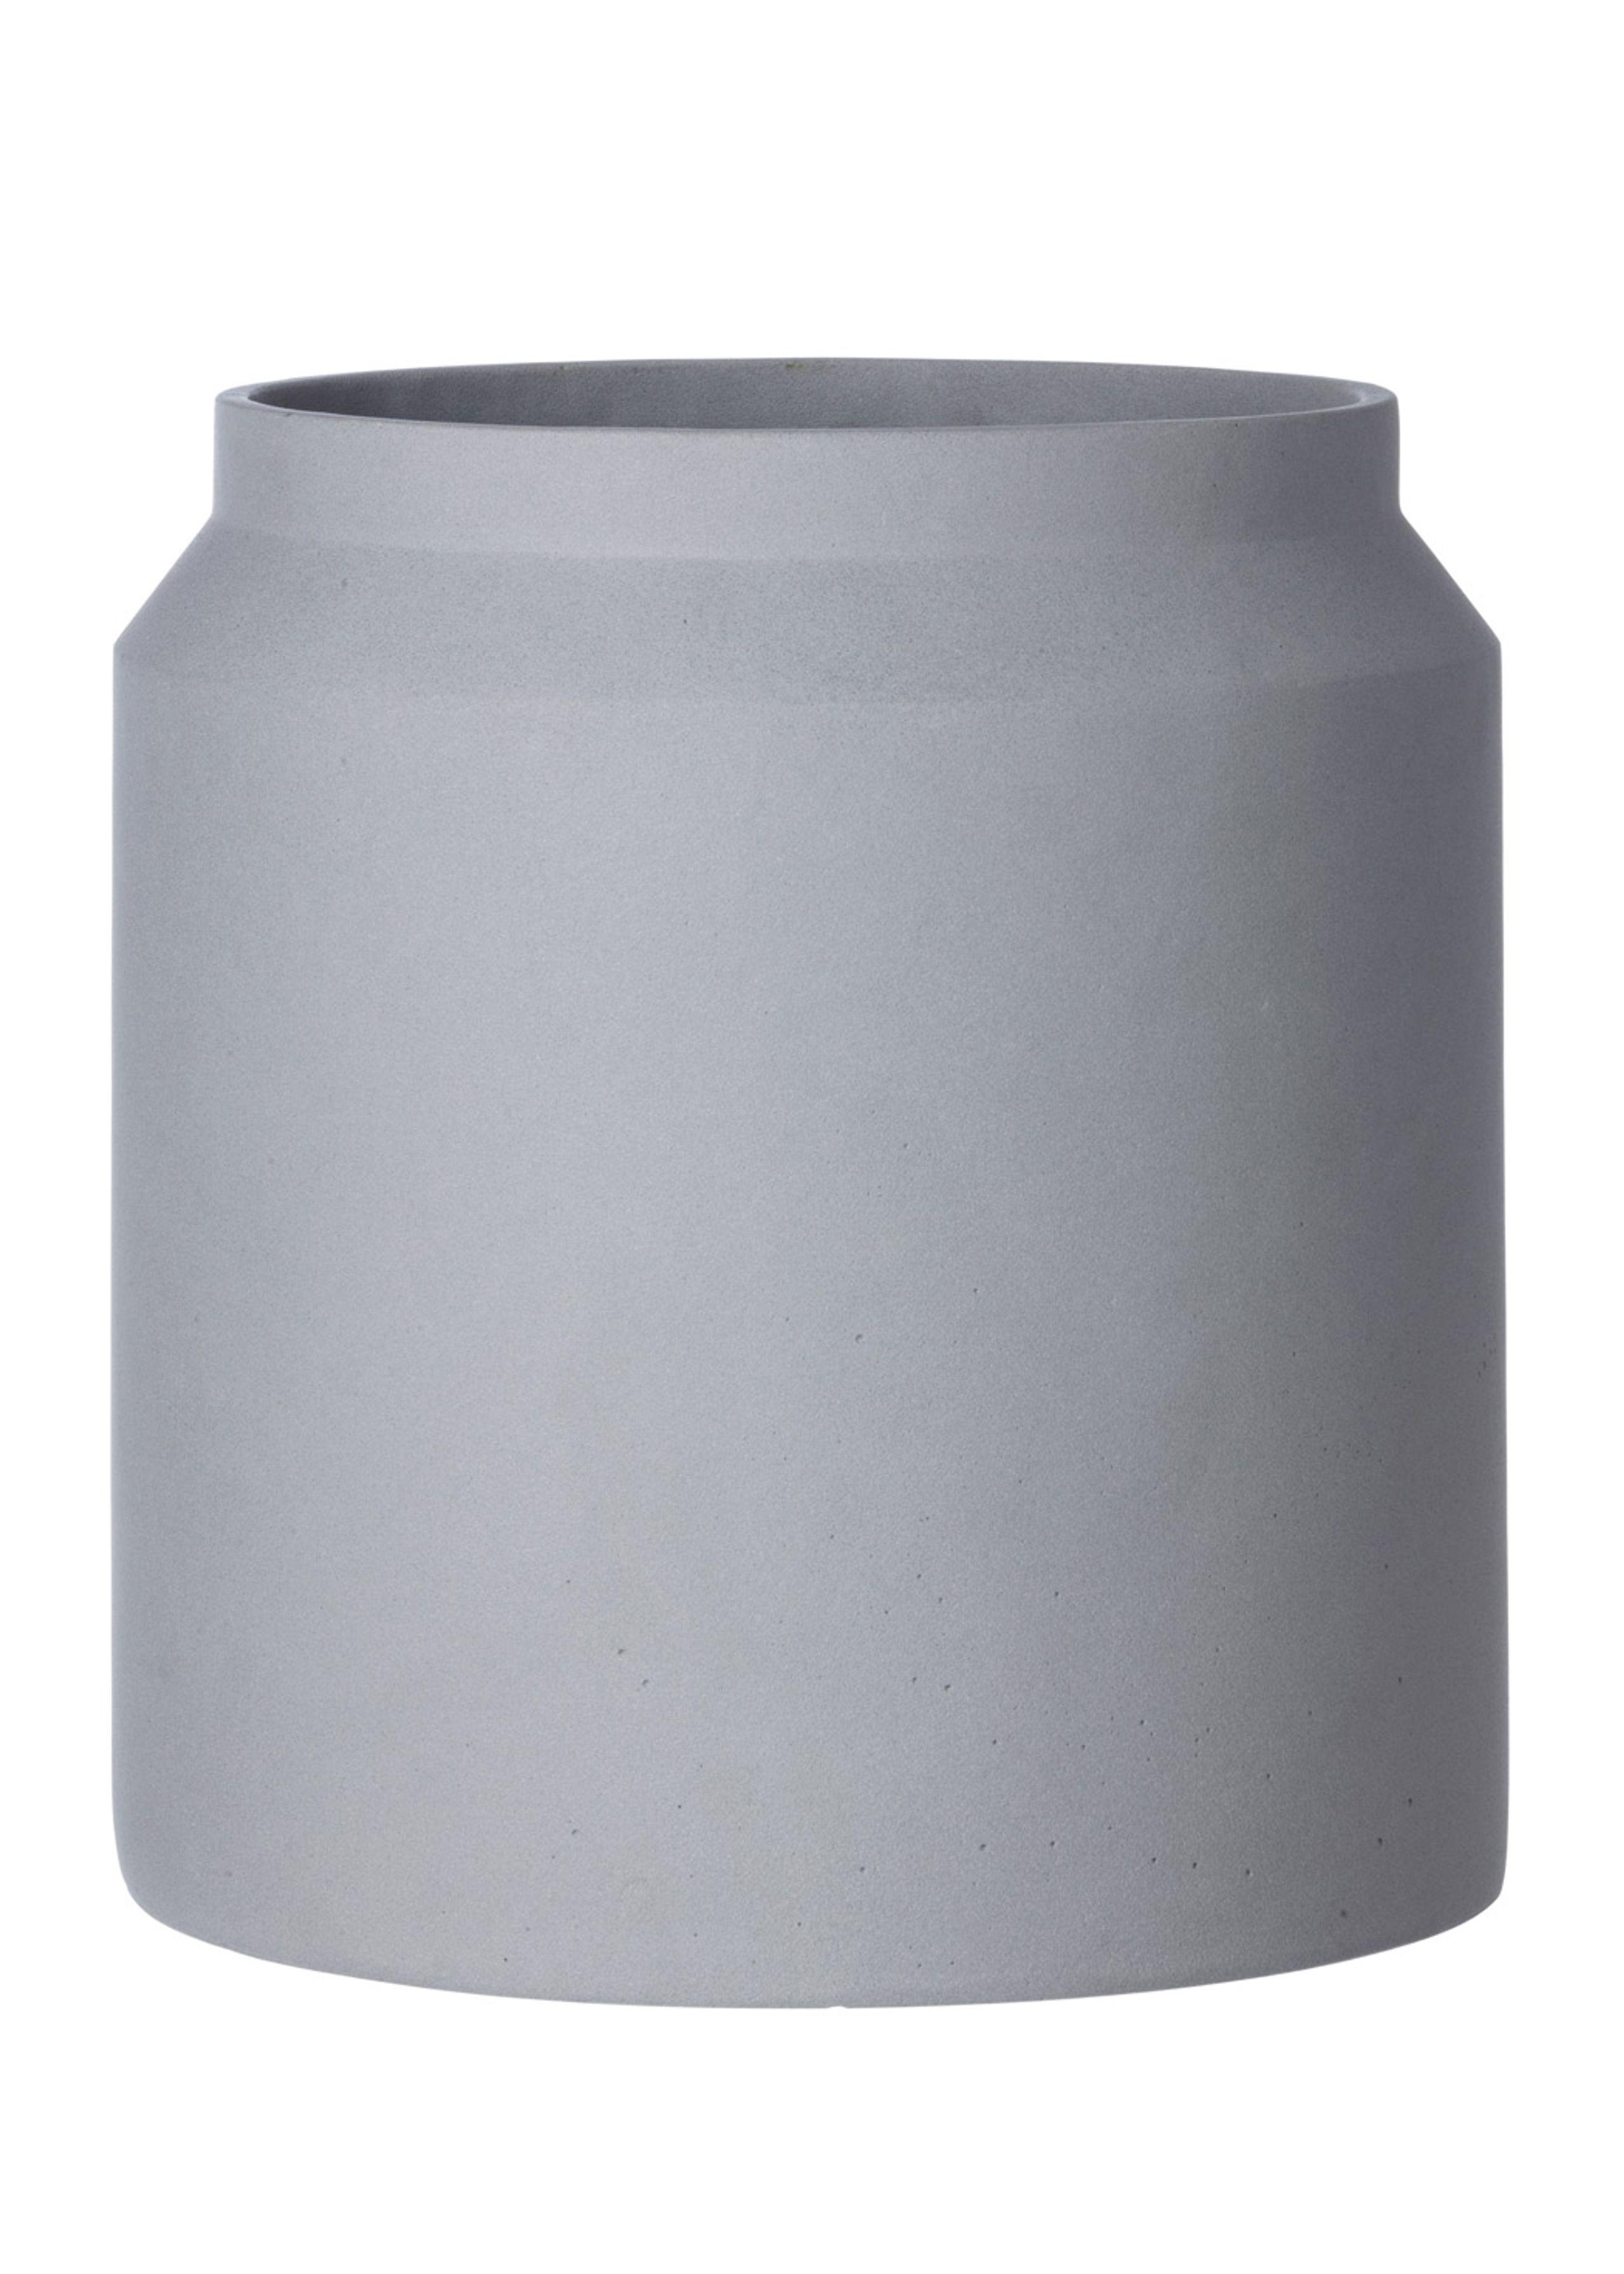 Image of   Outdoor Pot